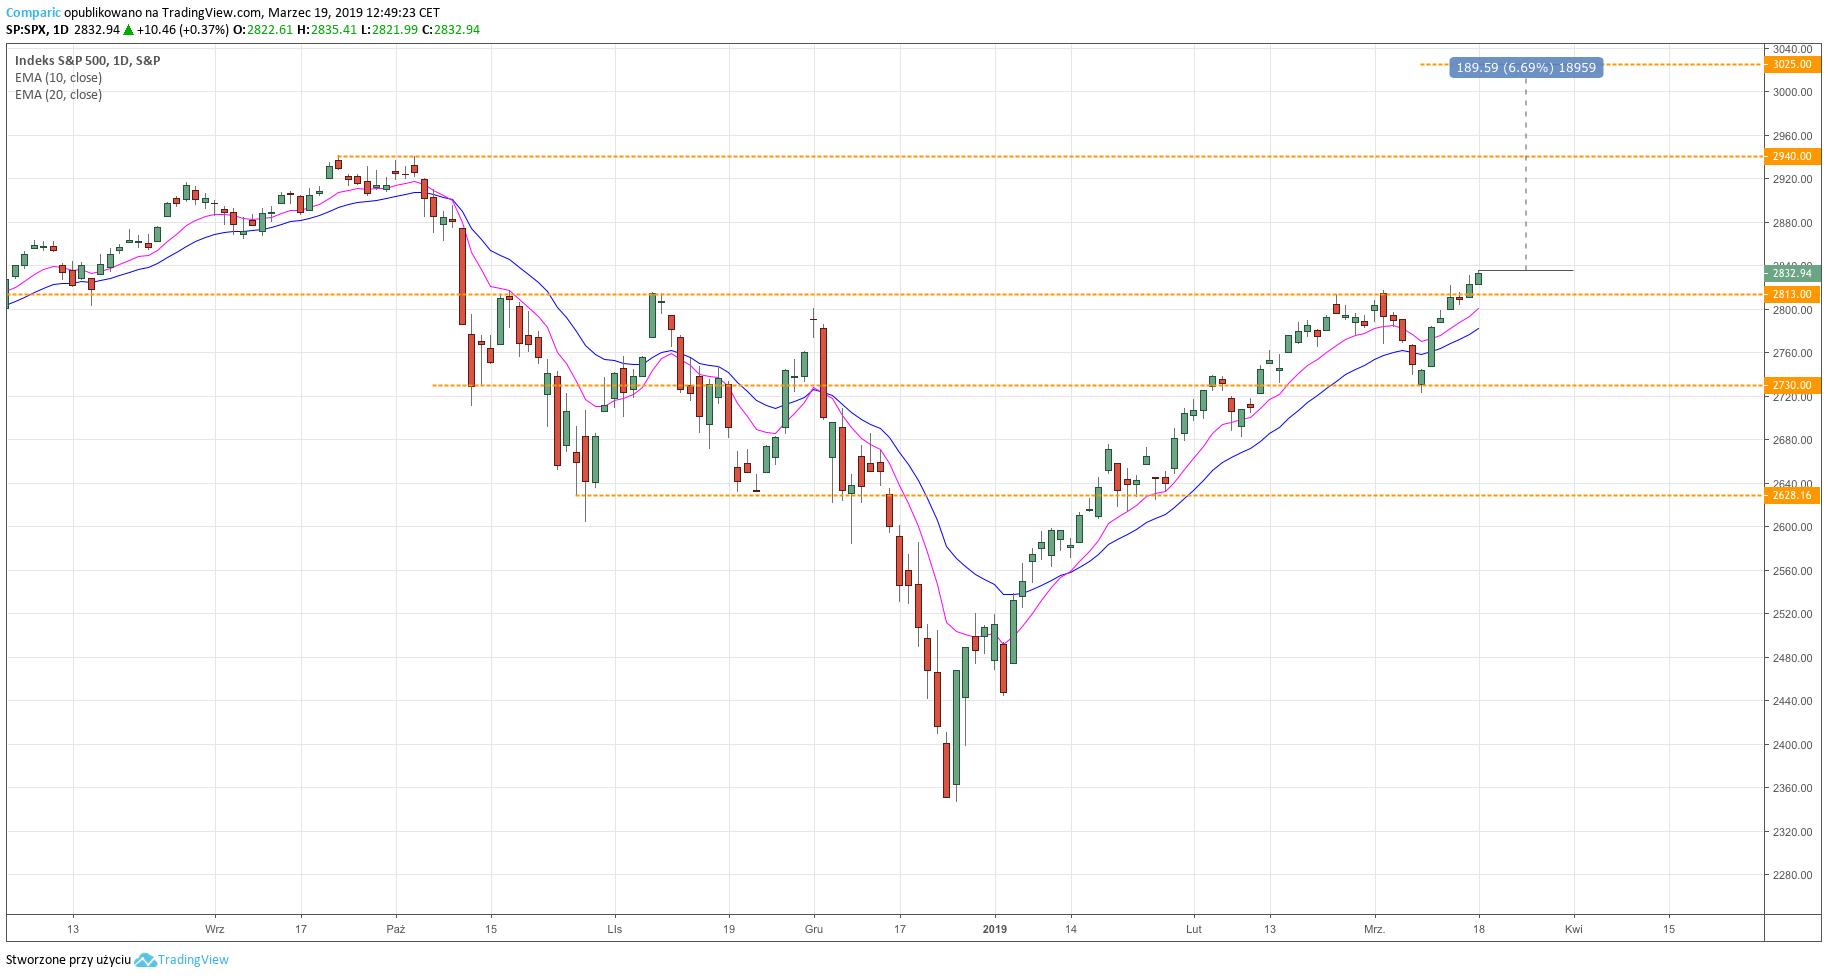 Indeks S&P500 - wykres dzienny - 19 marca 2019